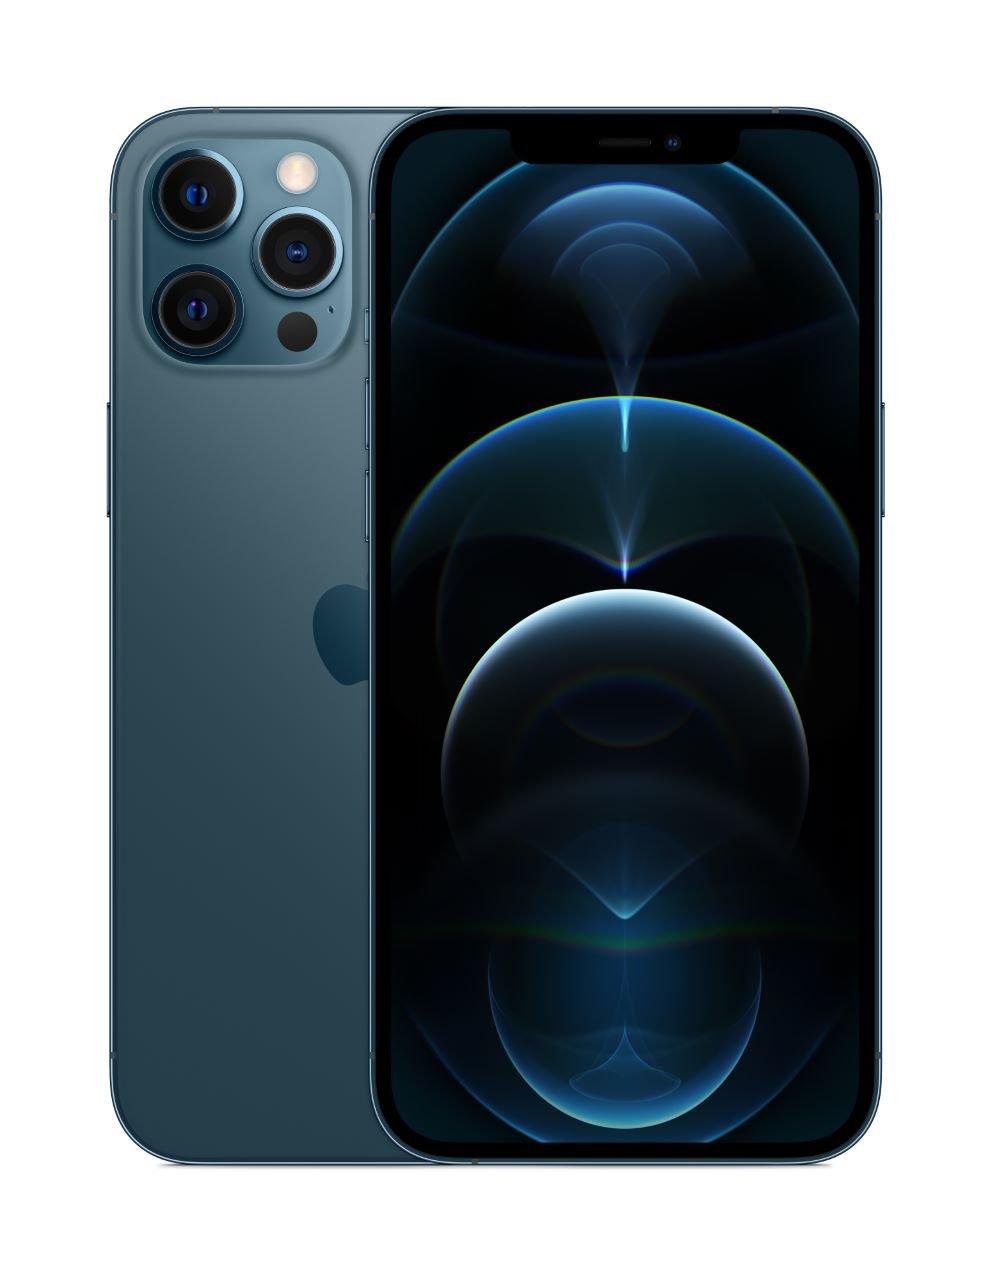 Apple iPhone 12 Pro Max Pazifikblau 128 GB MGDA3ZD/A